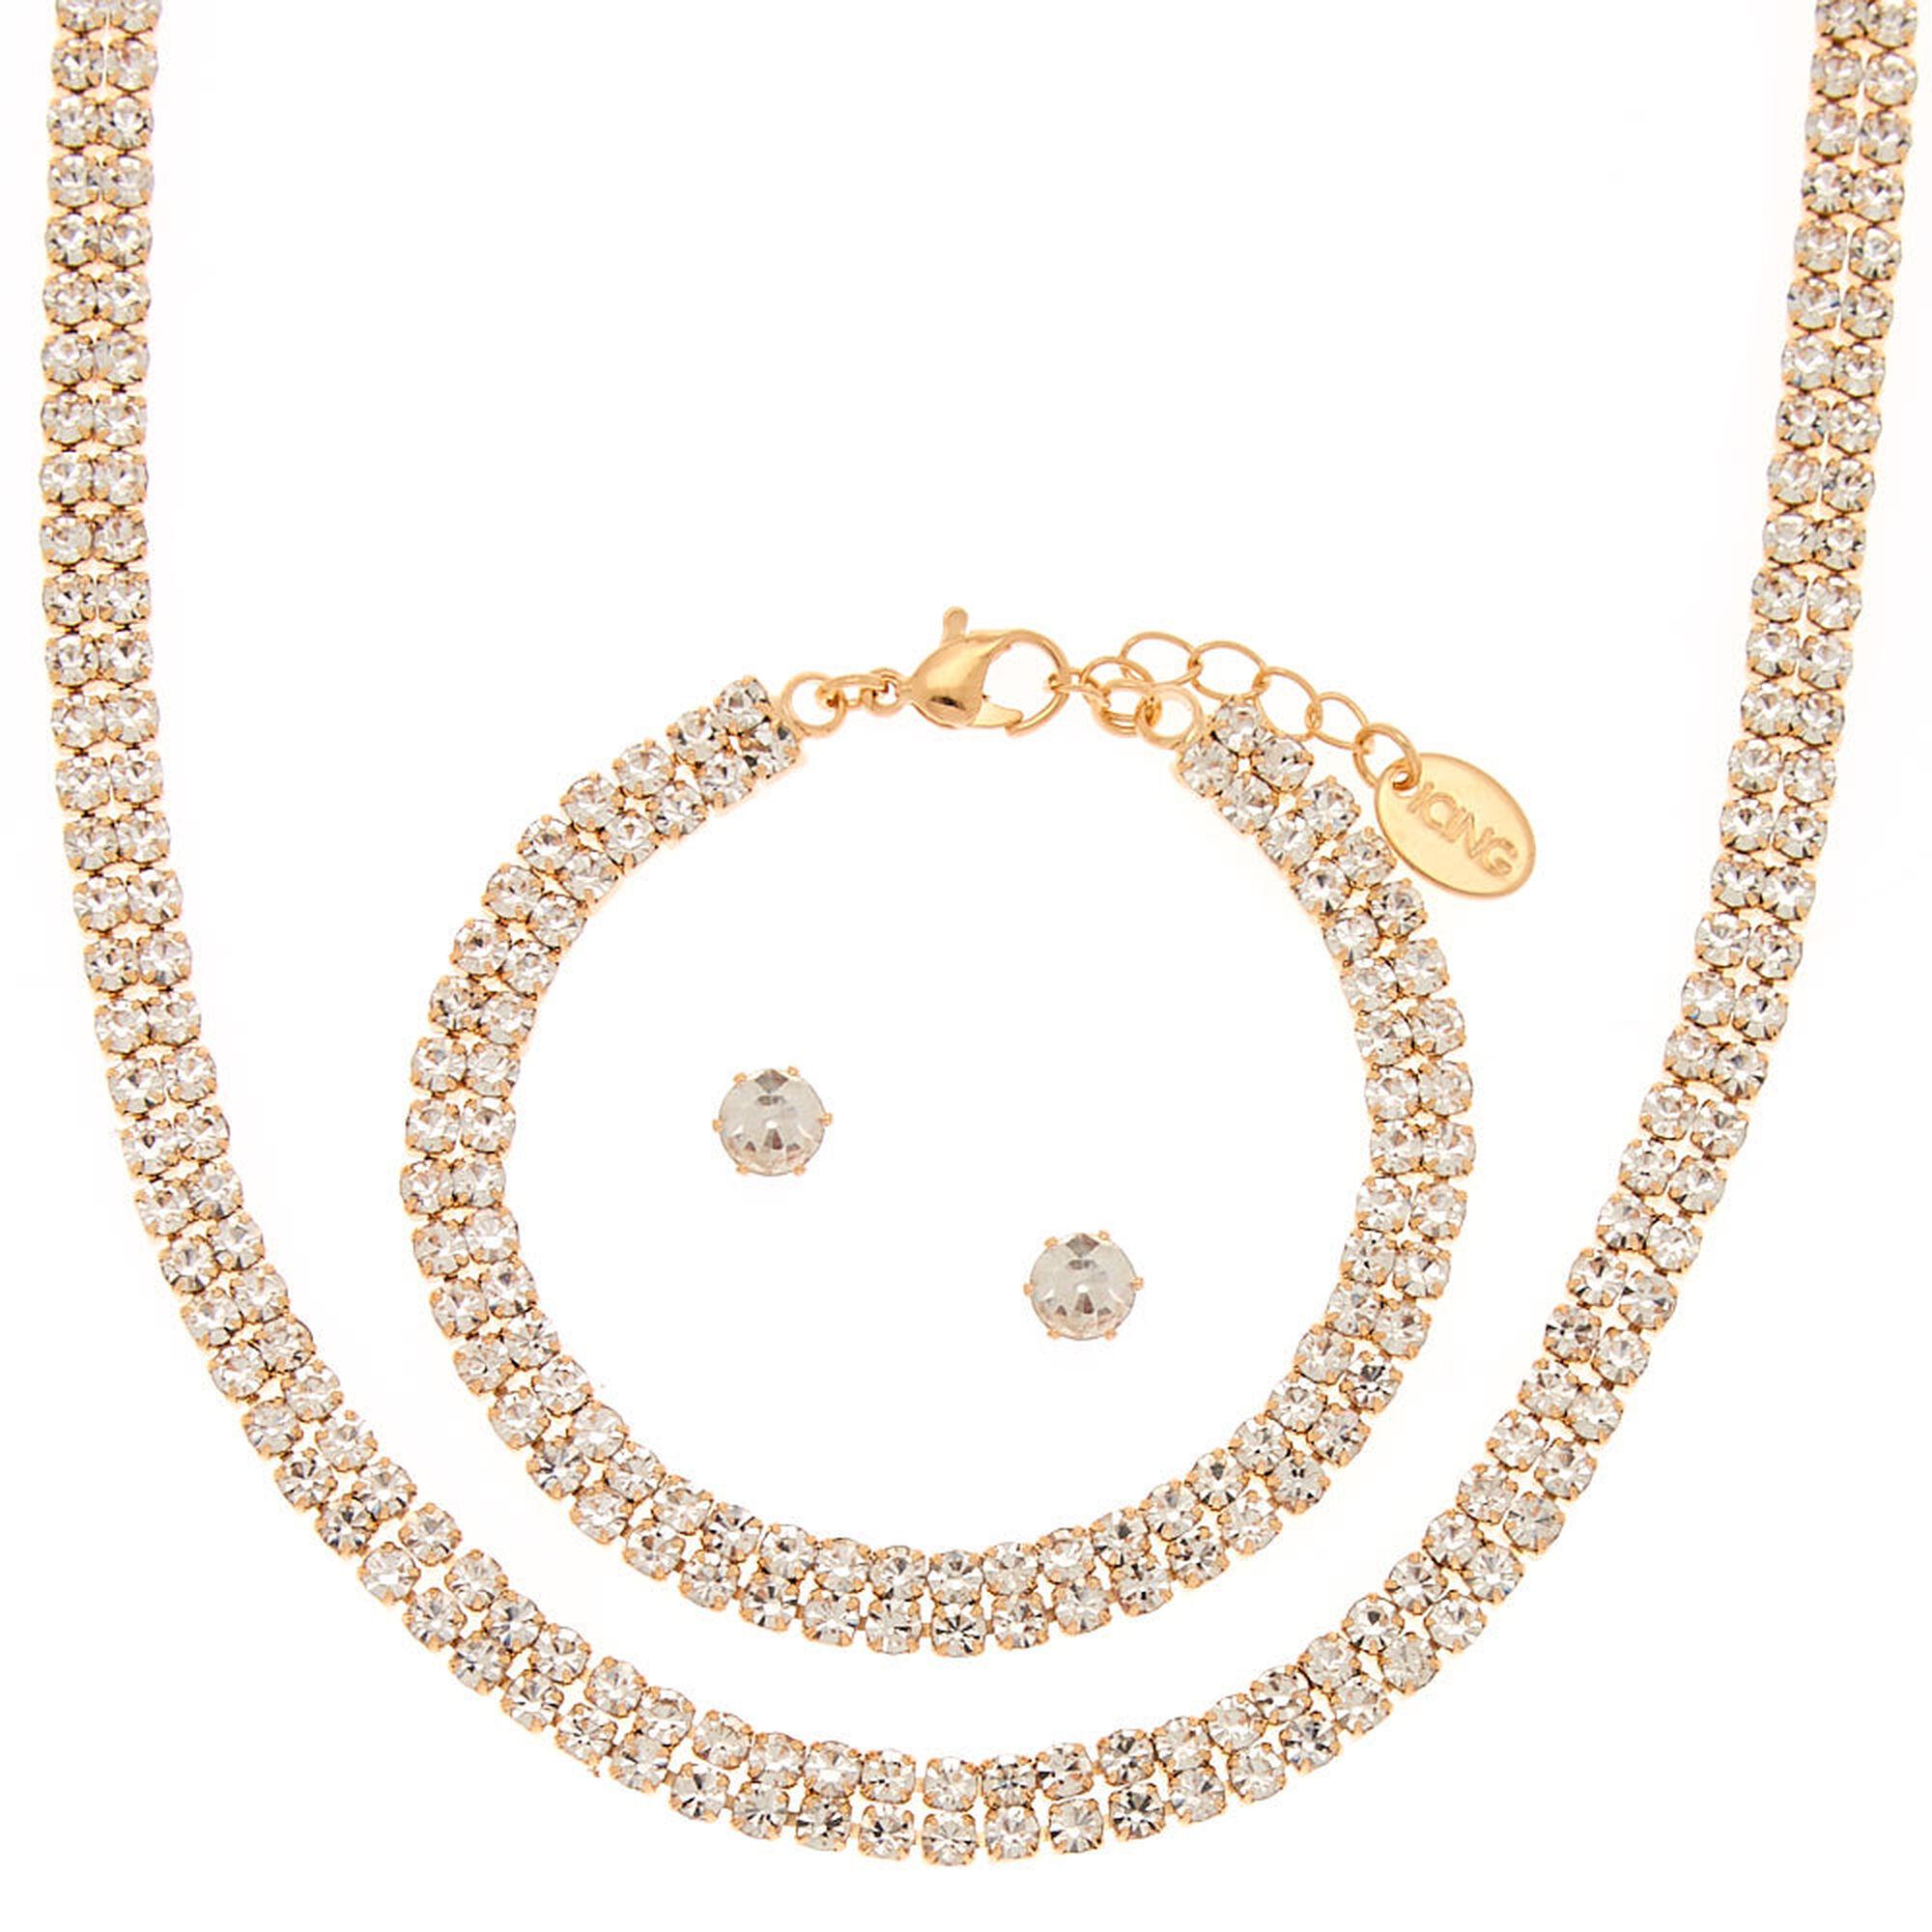 d6c6b9e452 Gold Rhinestone Choker Jewelry Set - 3 Pack